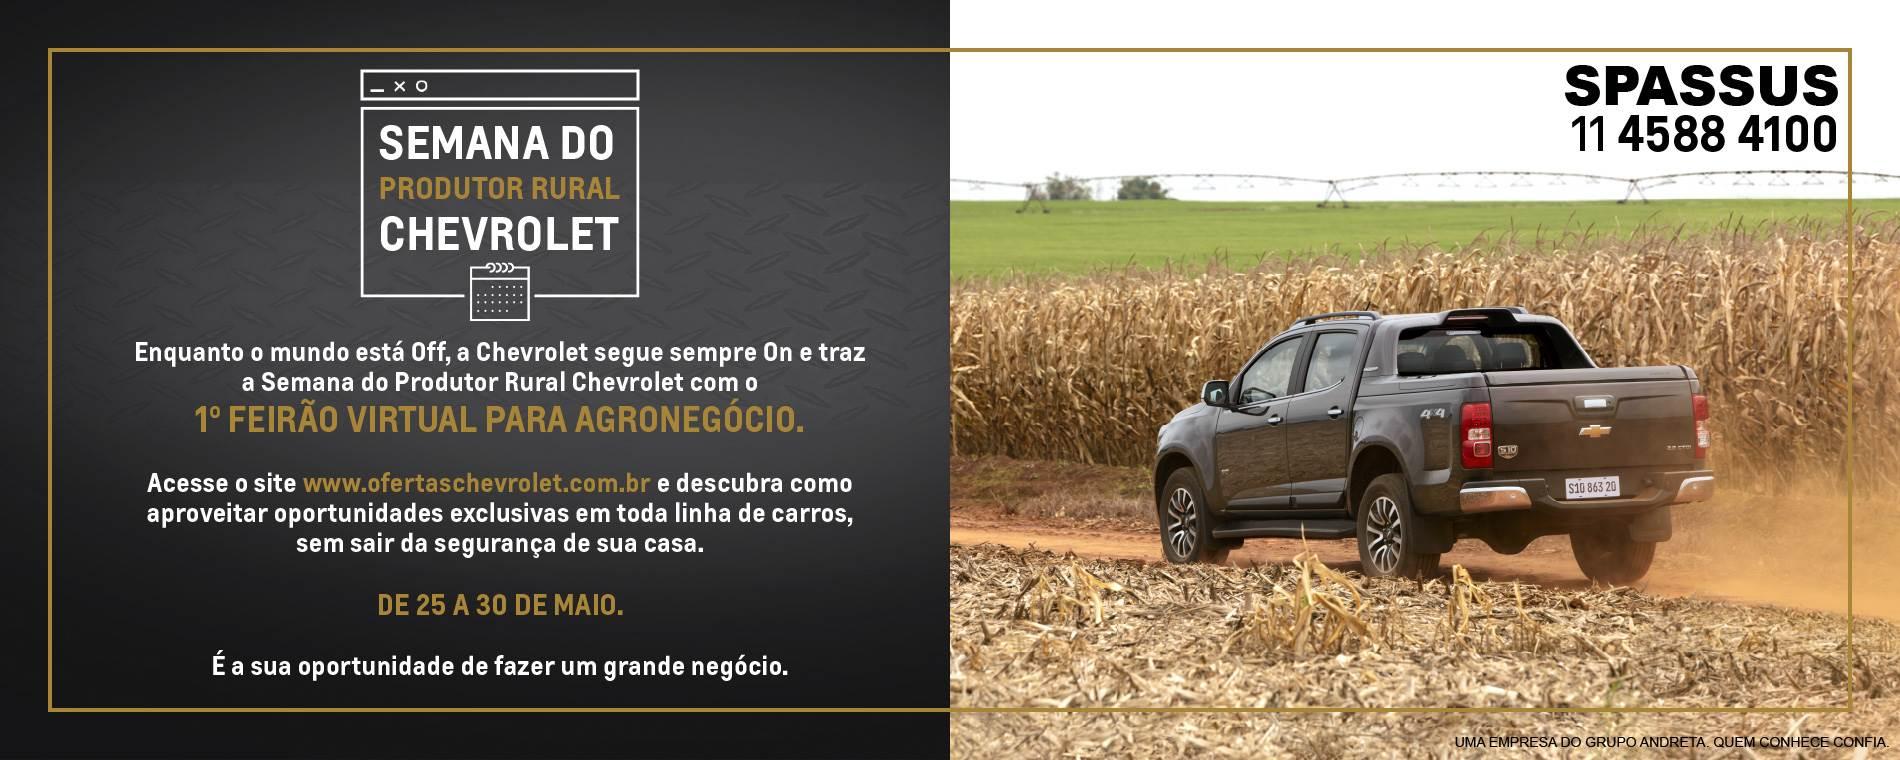 Spassus - Digitais Rural (Home)